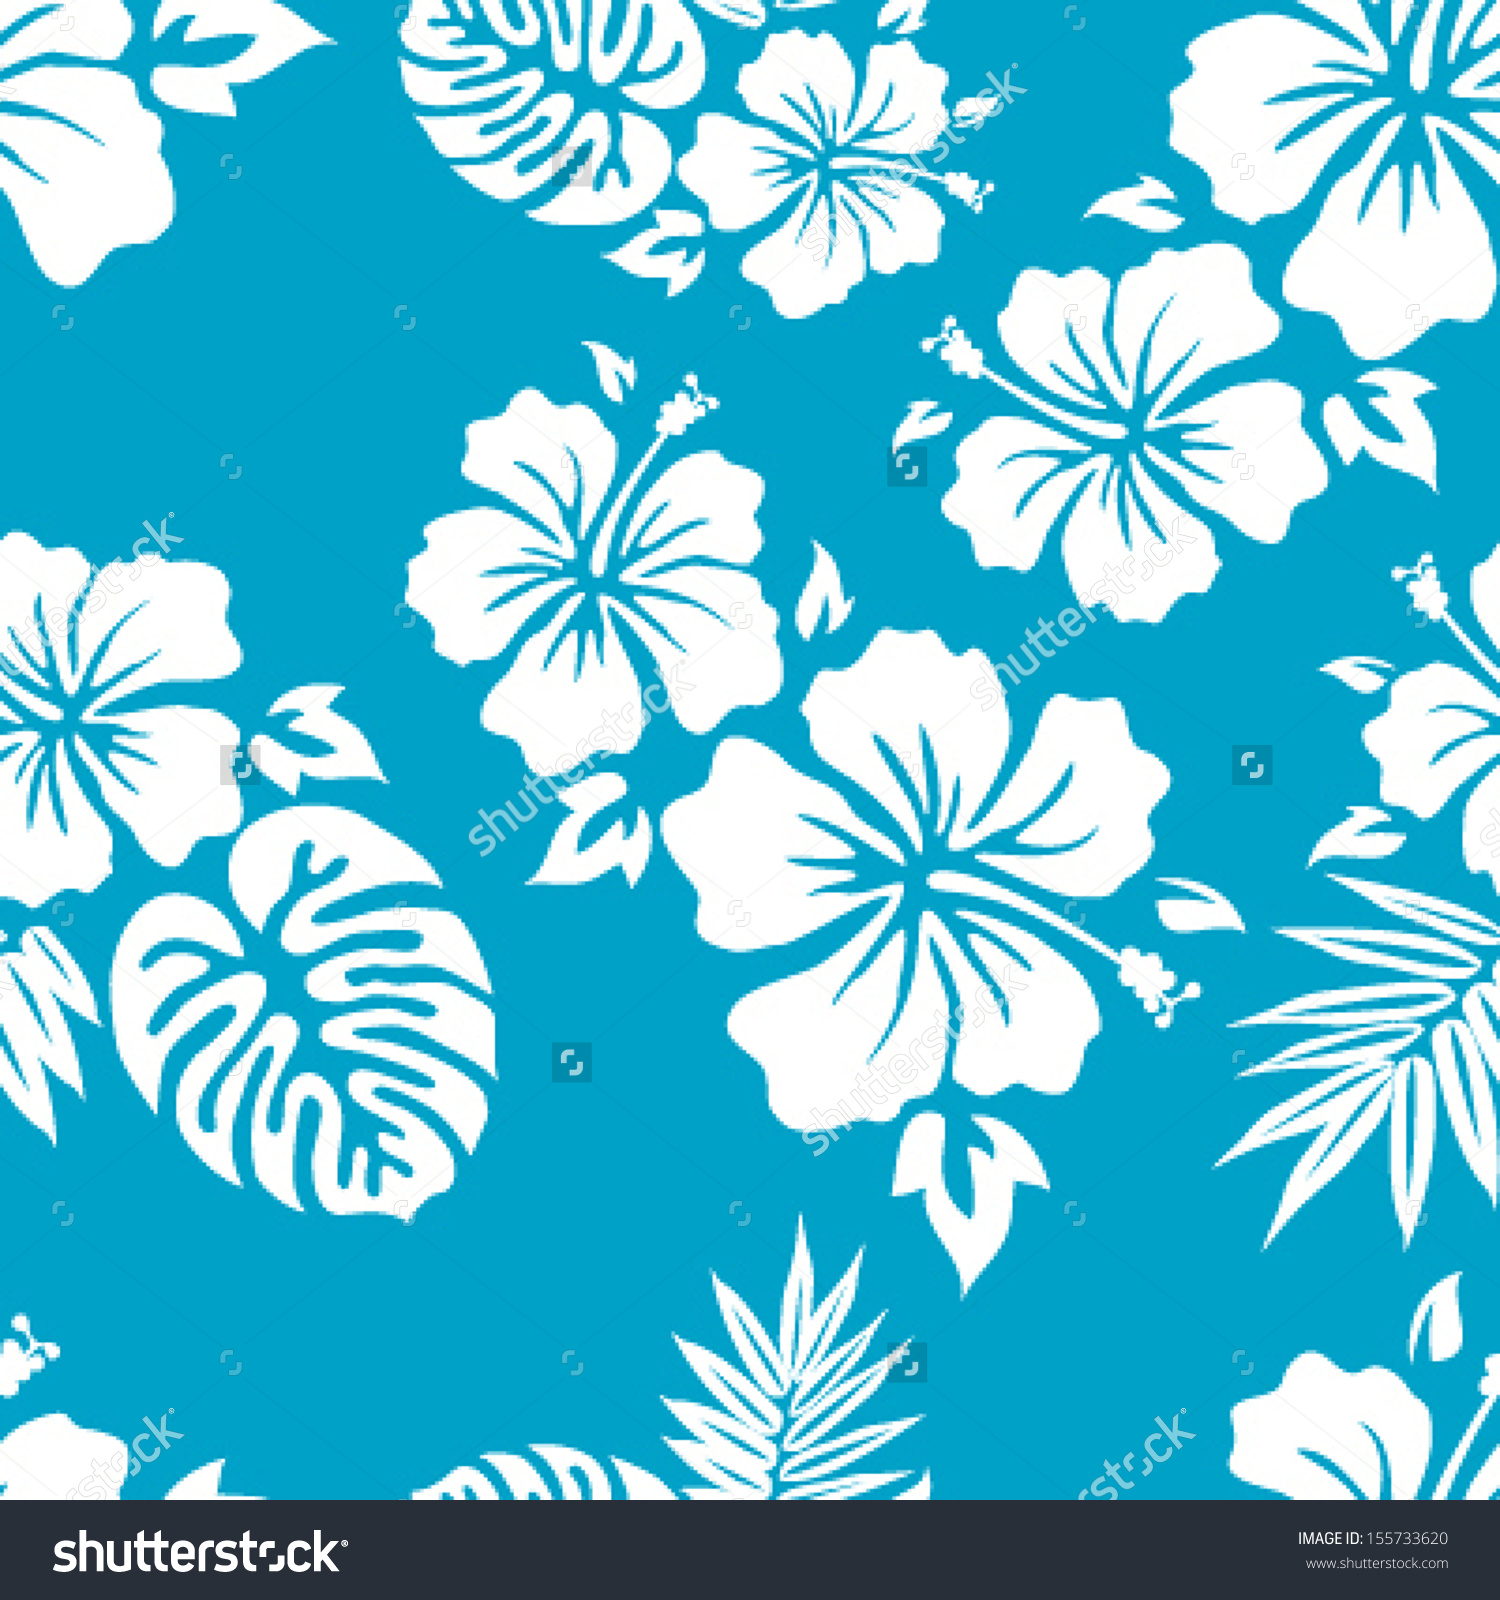 Hawaiian Aloha Shirt Seamless Background Pattern Stock Vector.